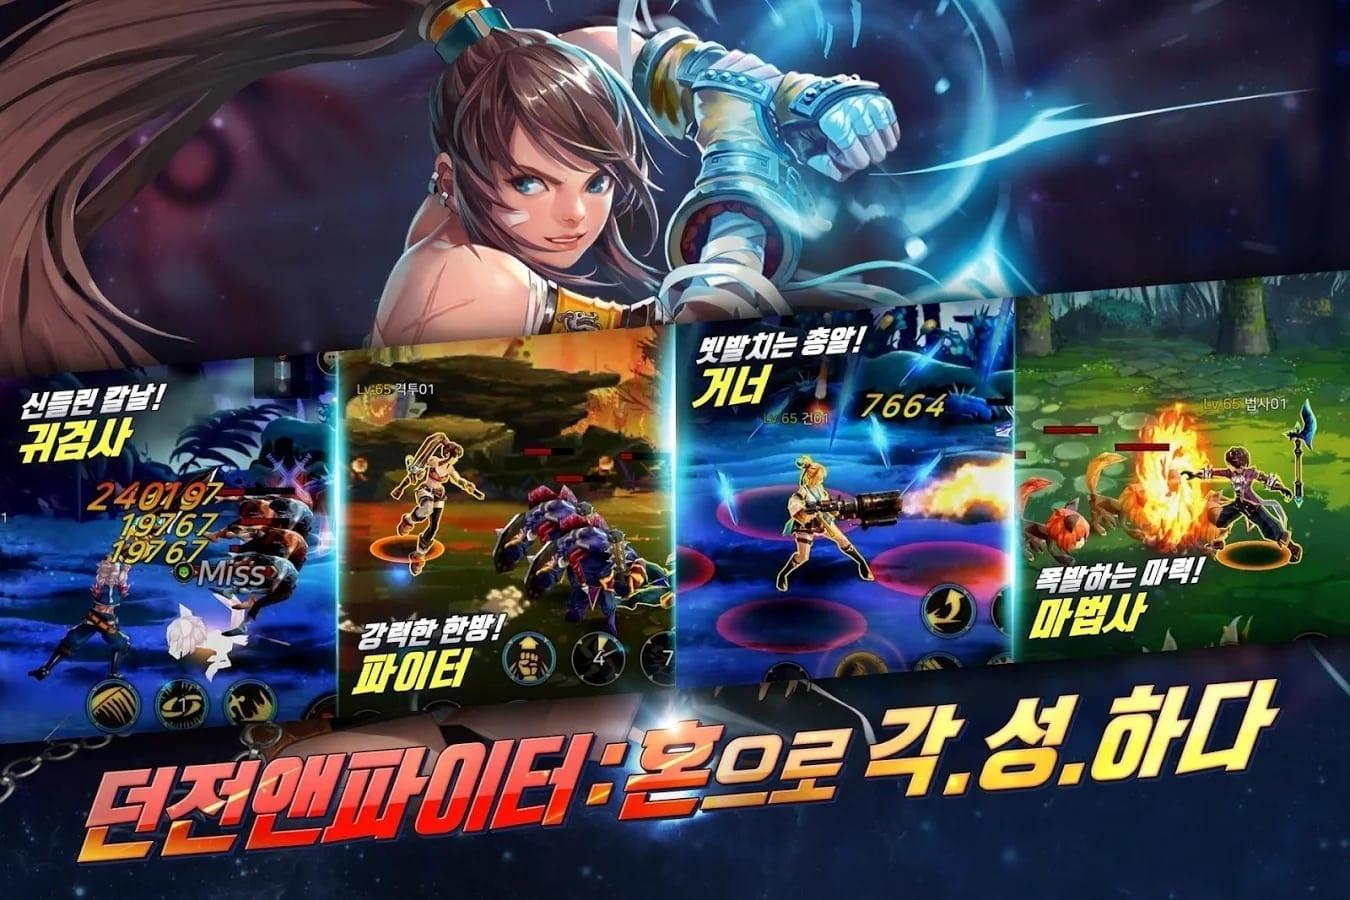 dungeon-fighter-spirit-google-play-image-3